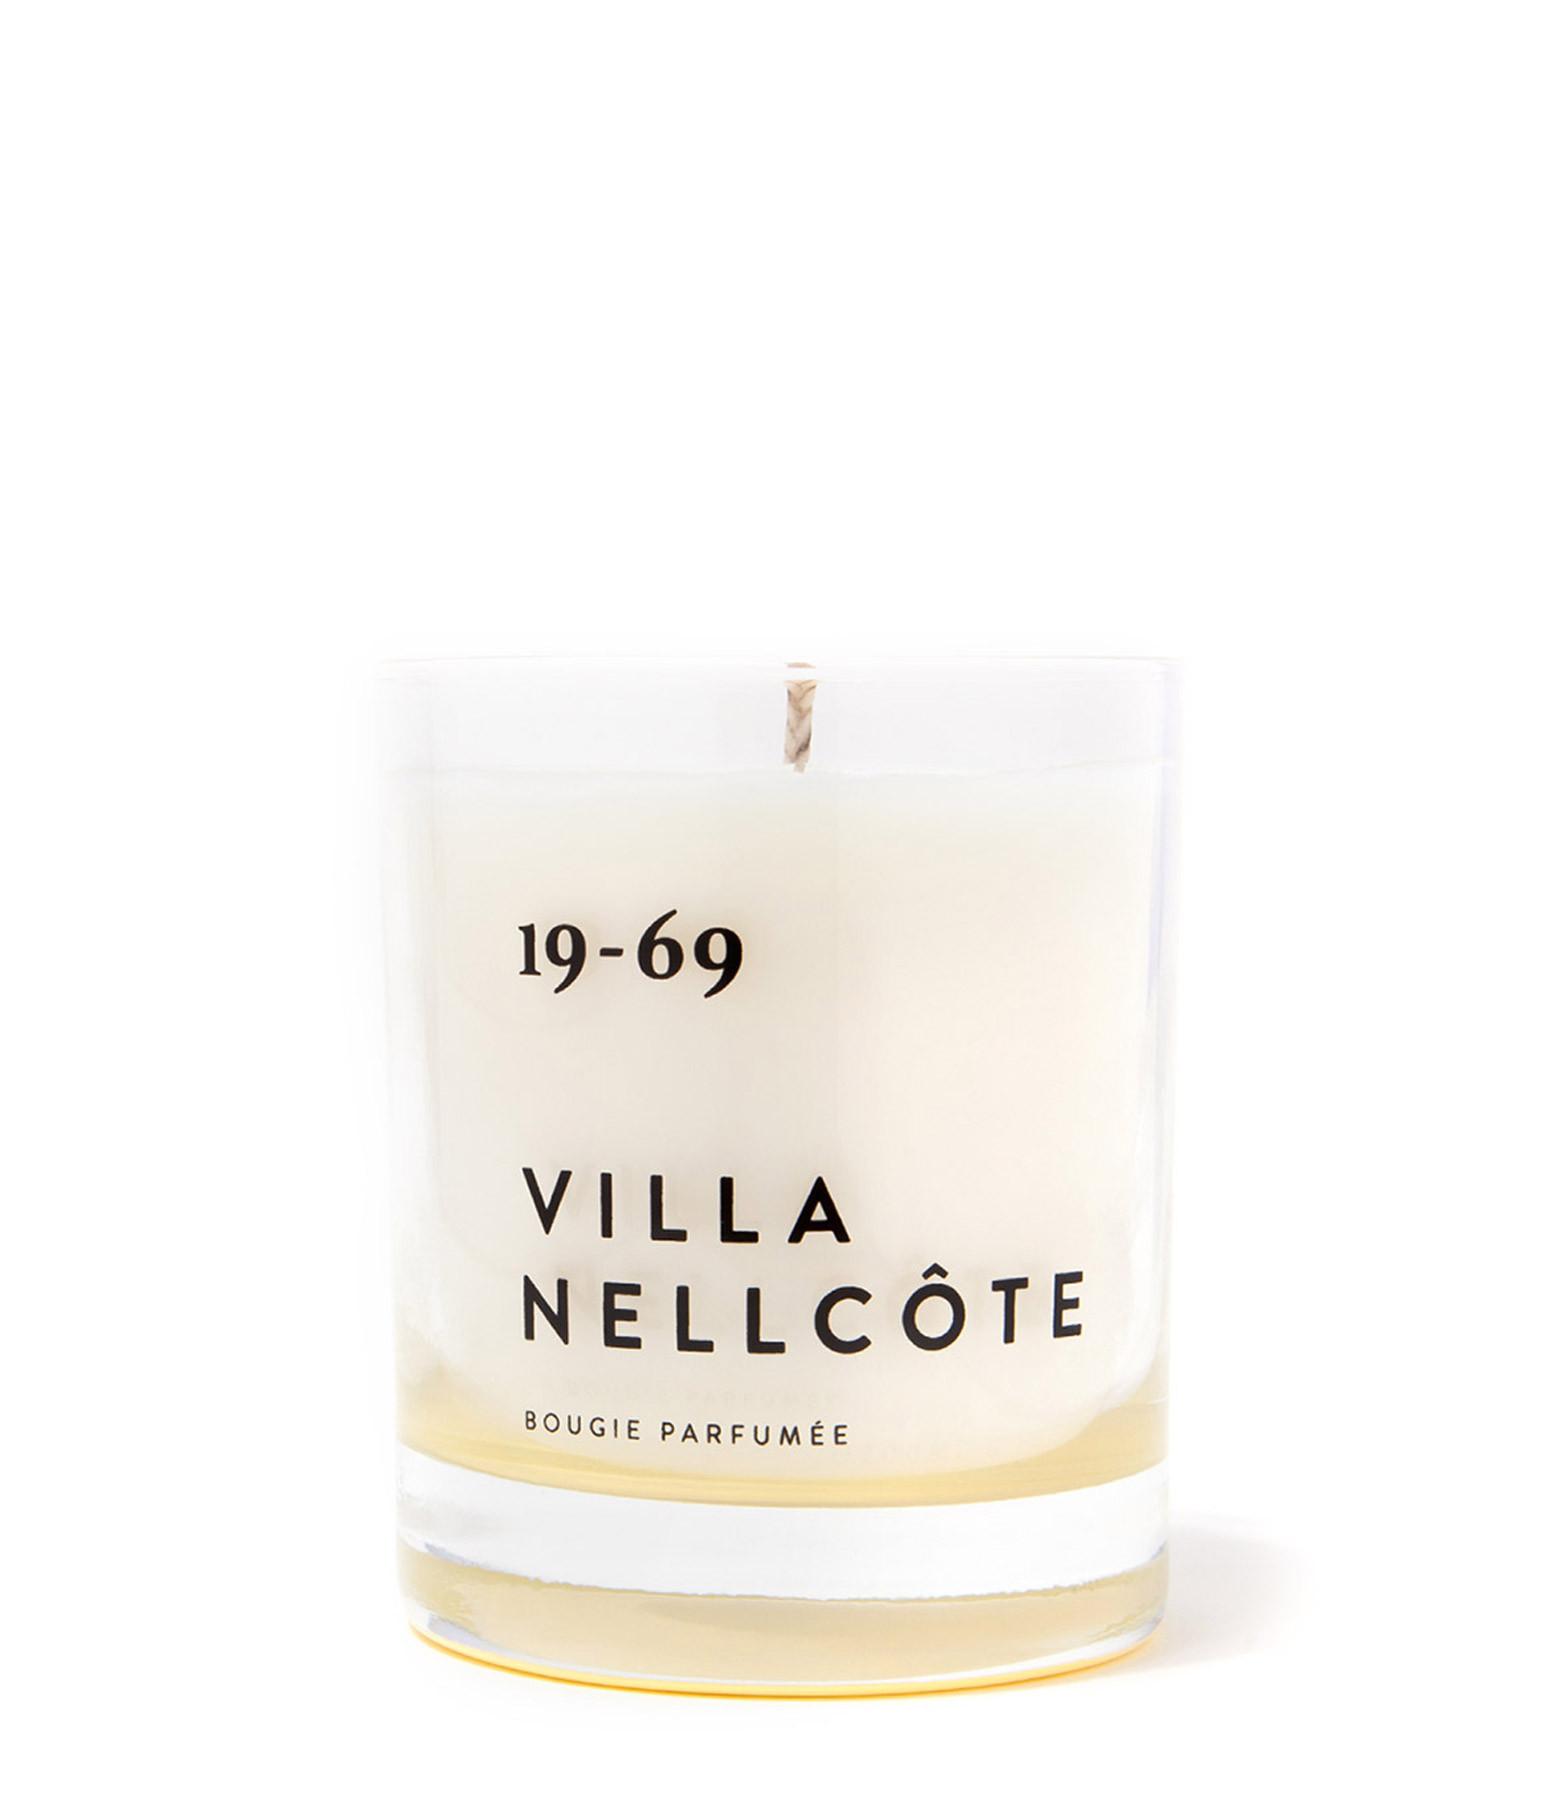 19-69 - Bougie Villa Nellcôte 200 ml